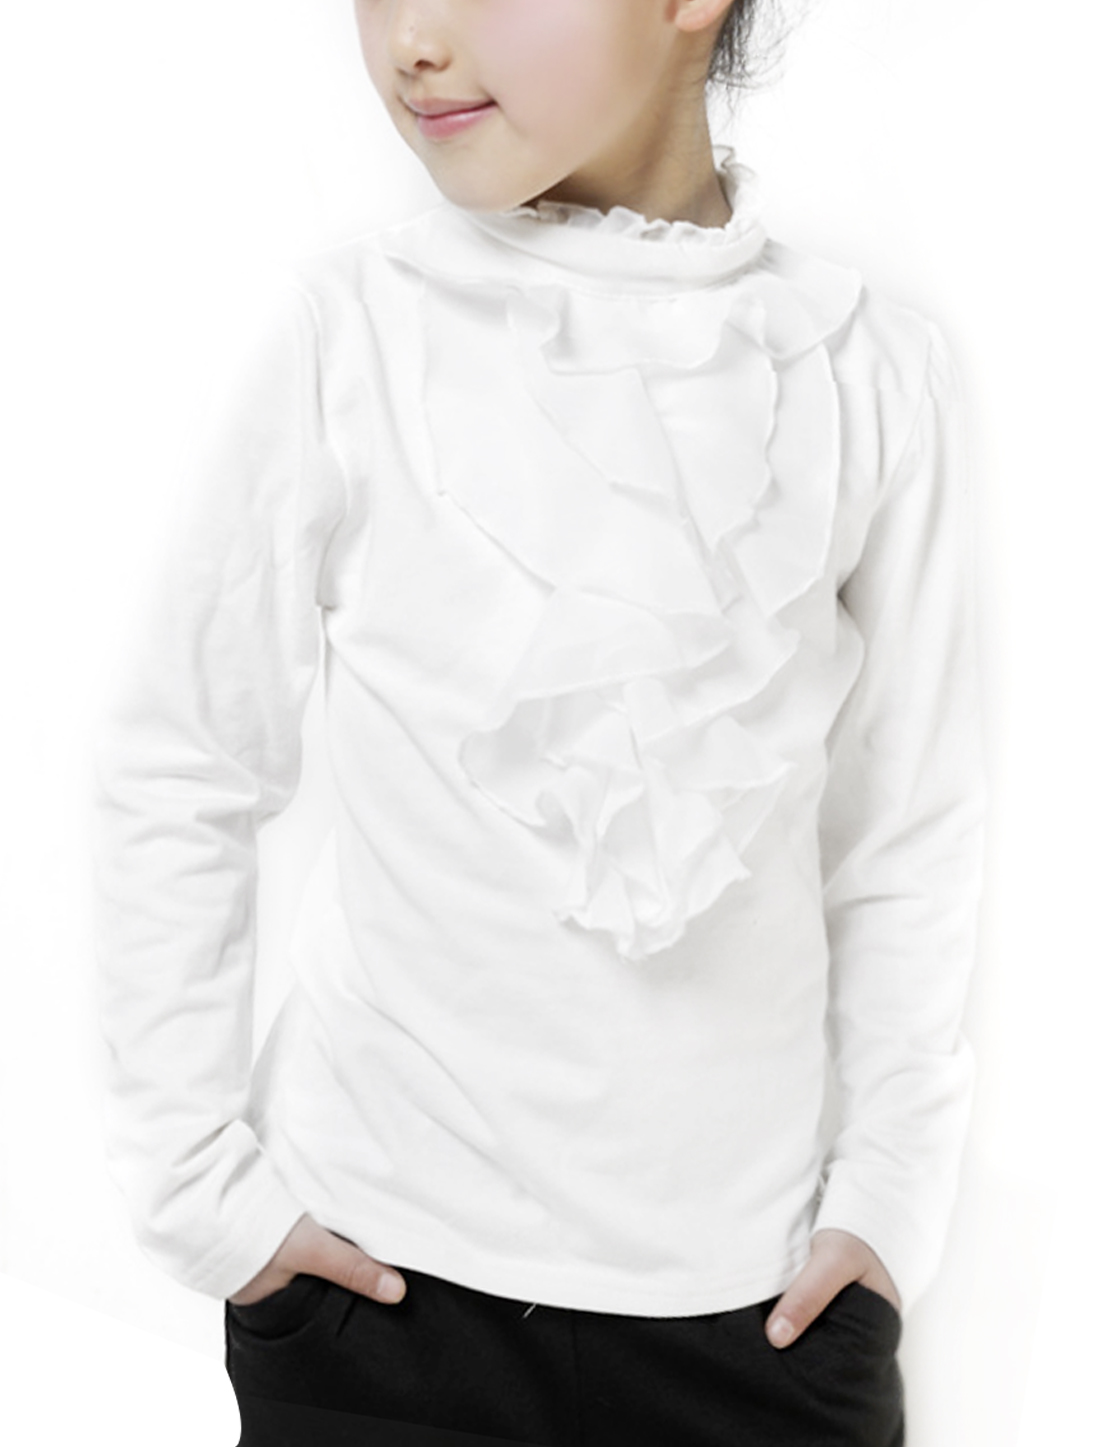 Girls Stretchy Sweet Top Shirt White 6